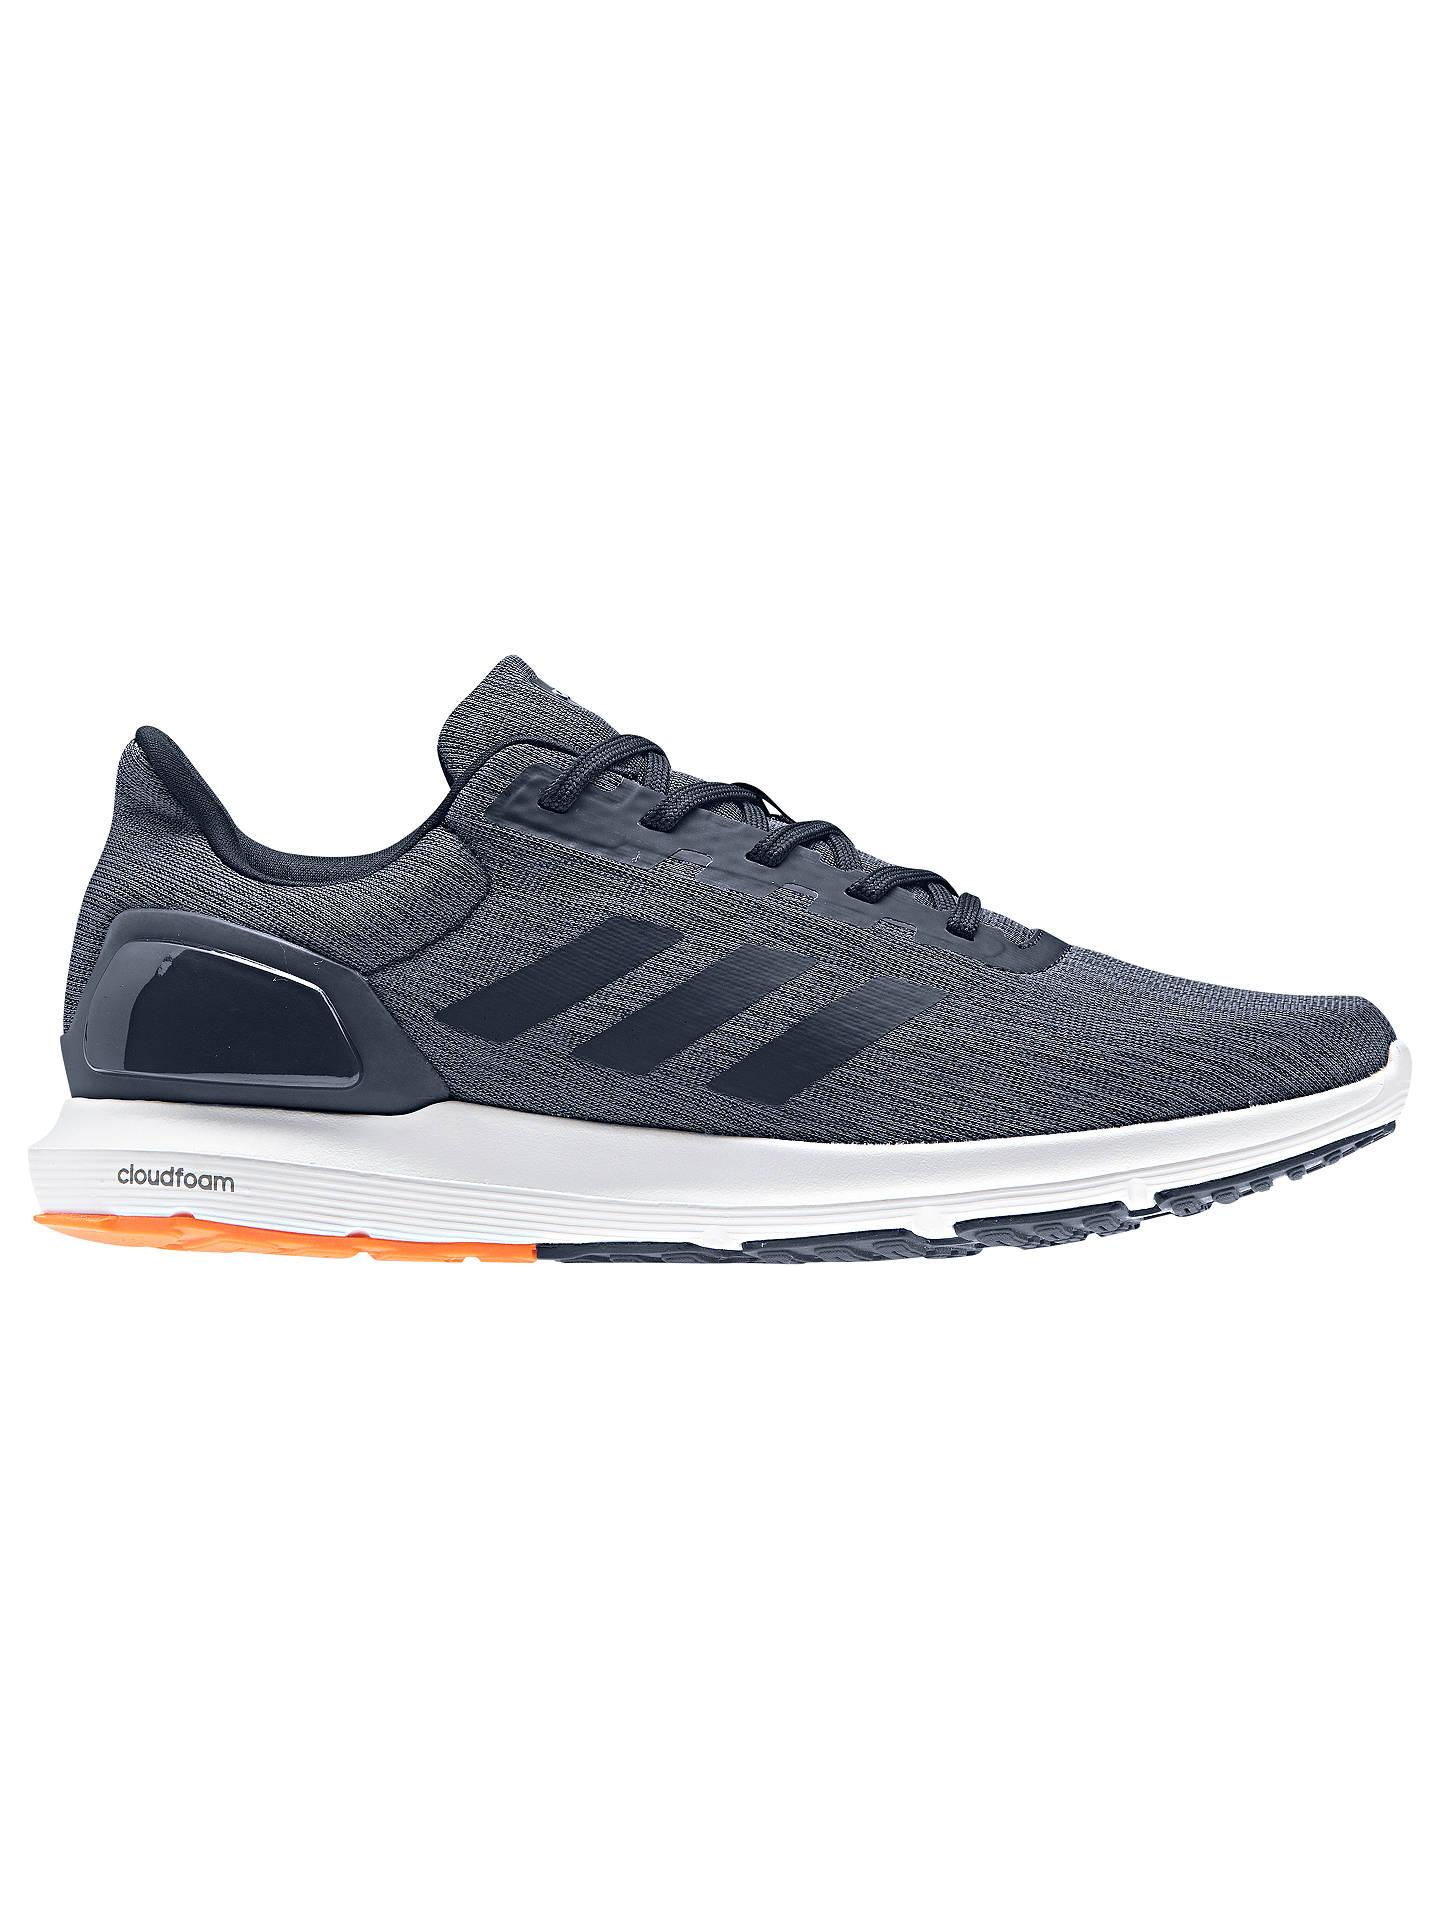 896cbd97a8d Buyadidas Cosmic 2.0 Men s Running Shoes